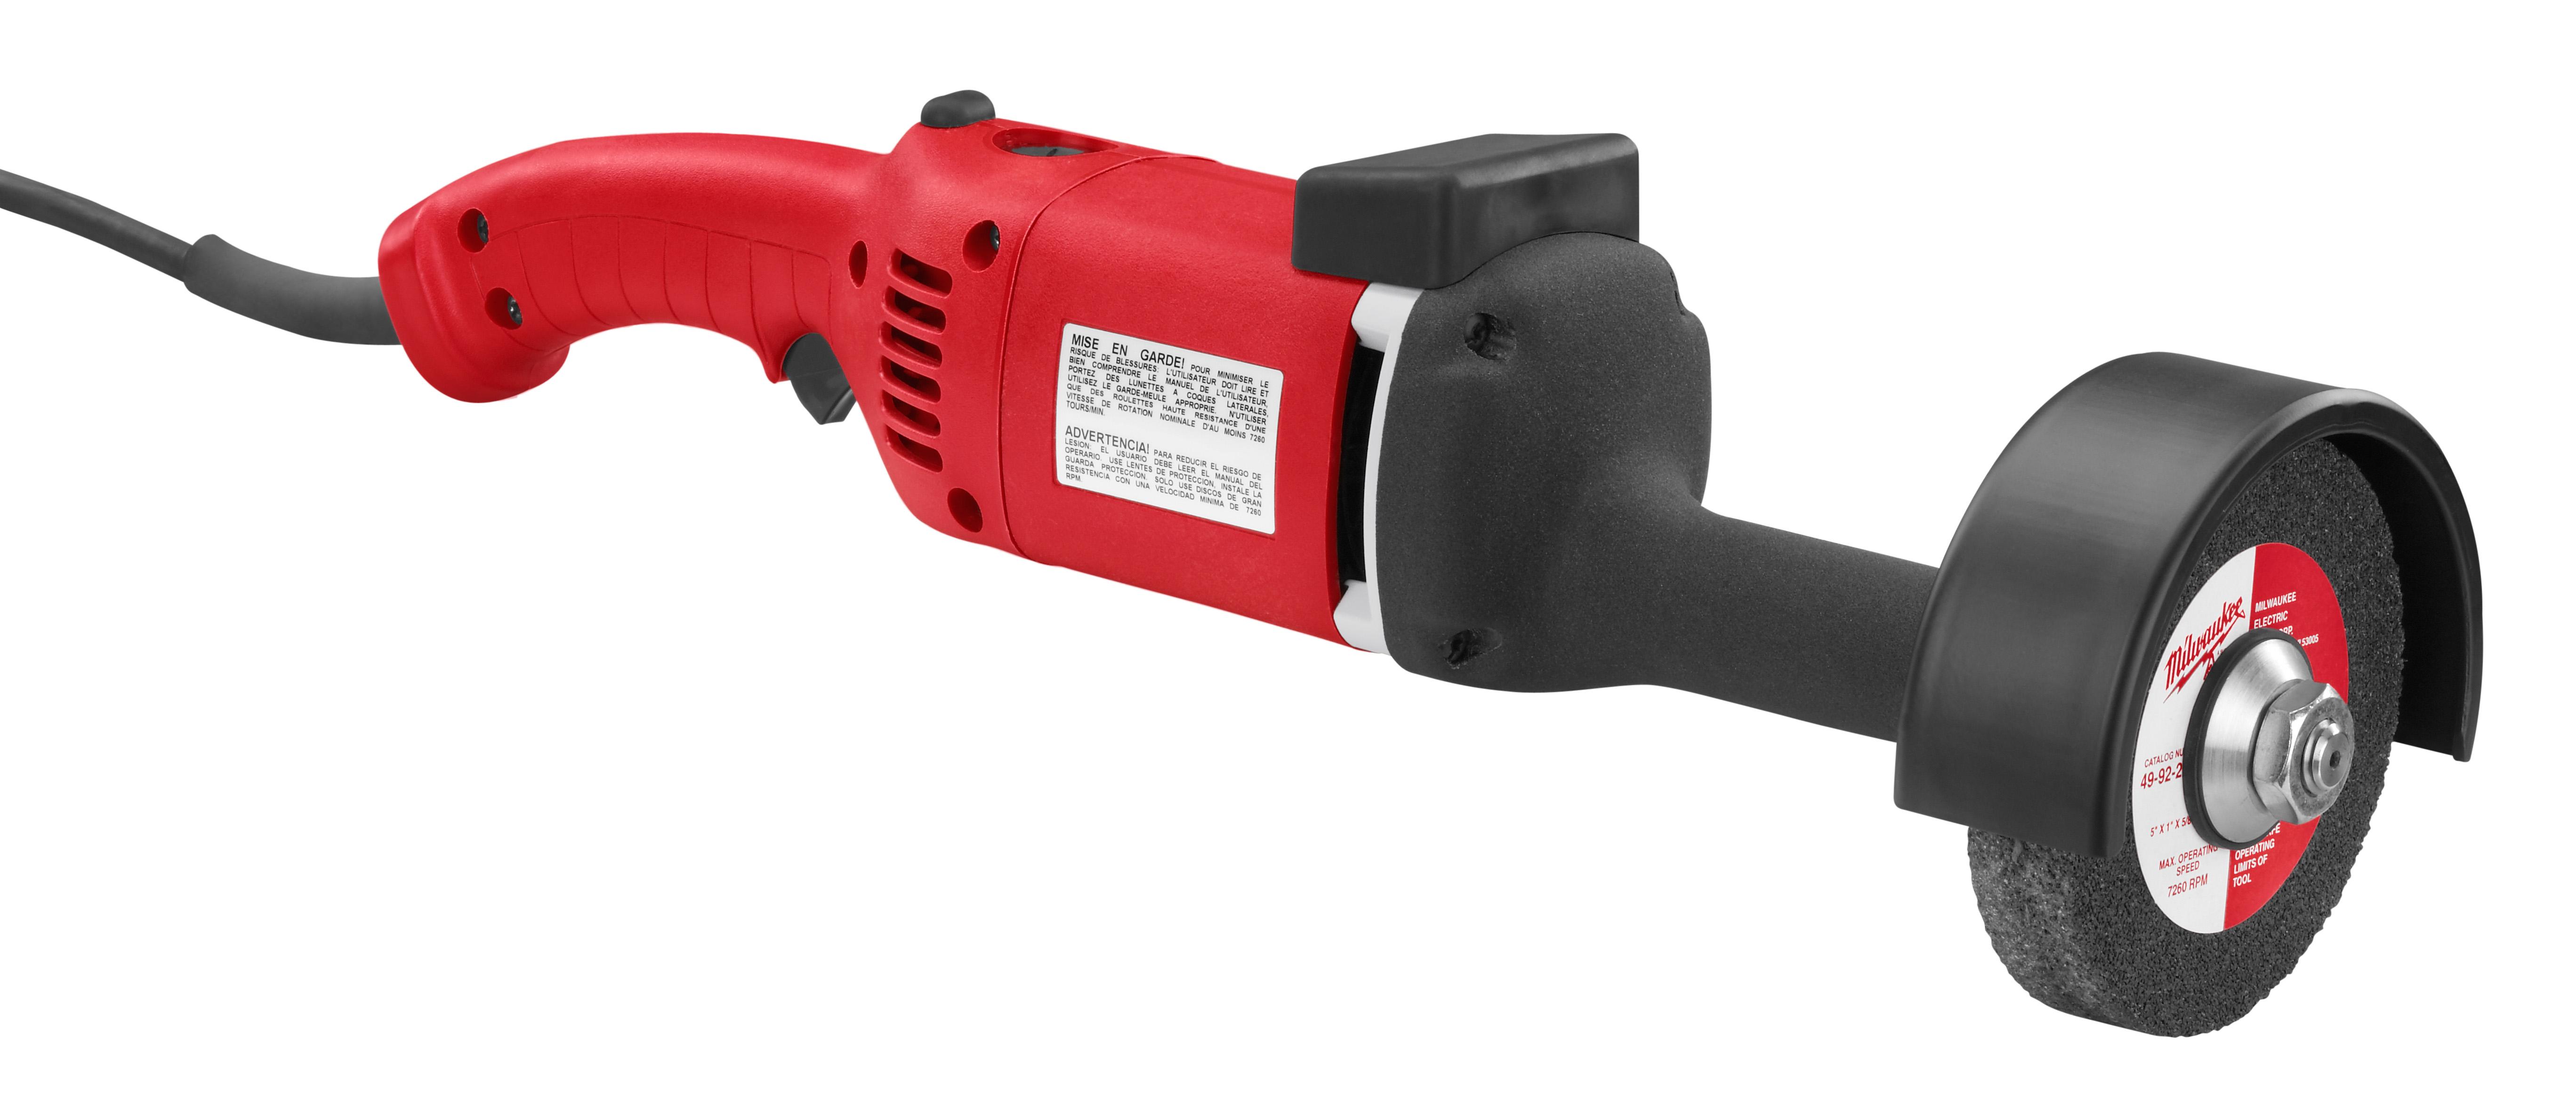 Milwaukee® 5223 Straight Die Grinder, 5 in Dia Wheel, 7000 rpm Speed, 120 VAC/VDC, For Wheel: Type 5, Trigger Lock Switch